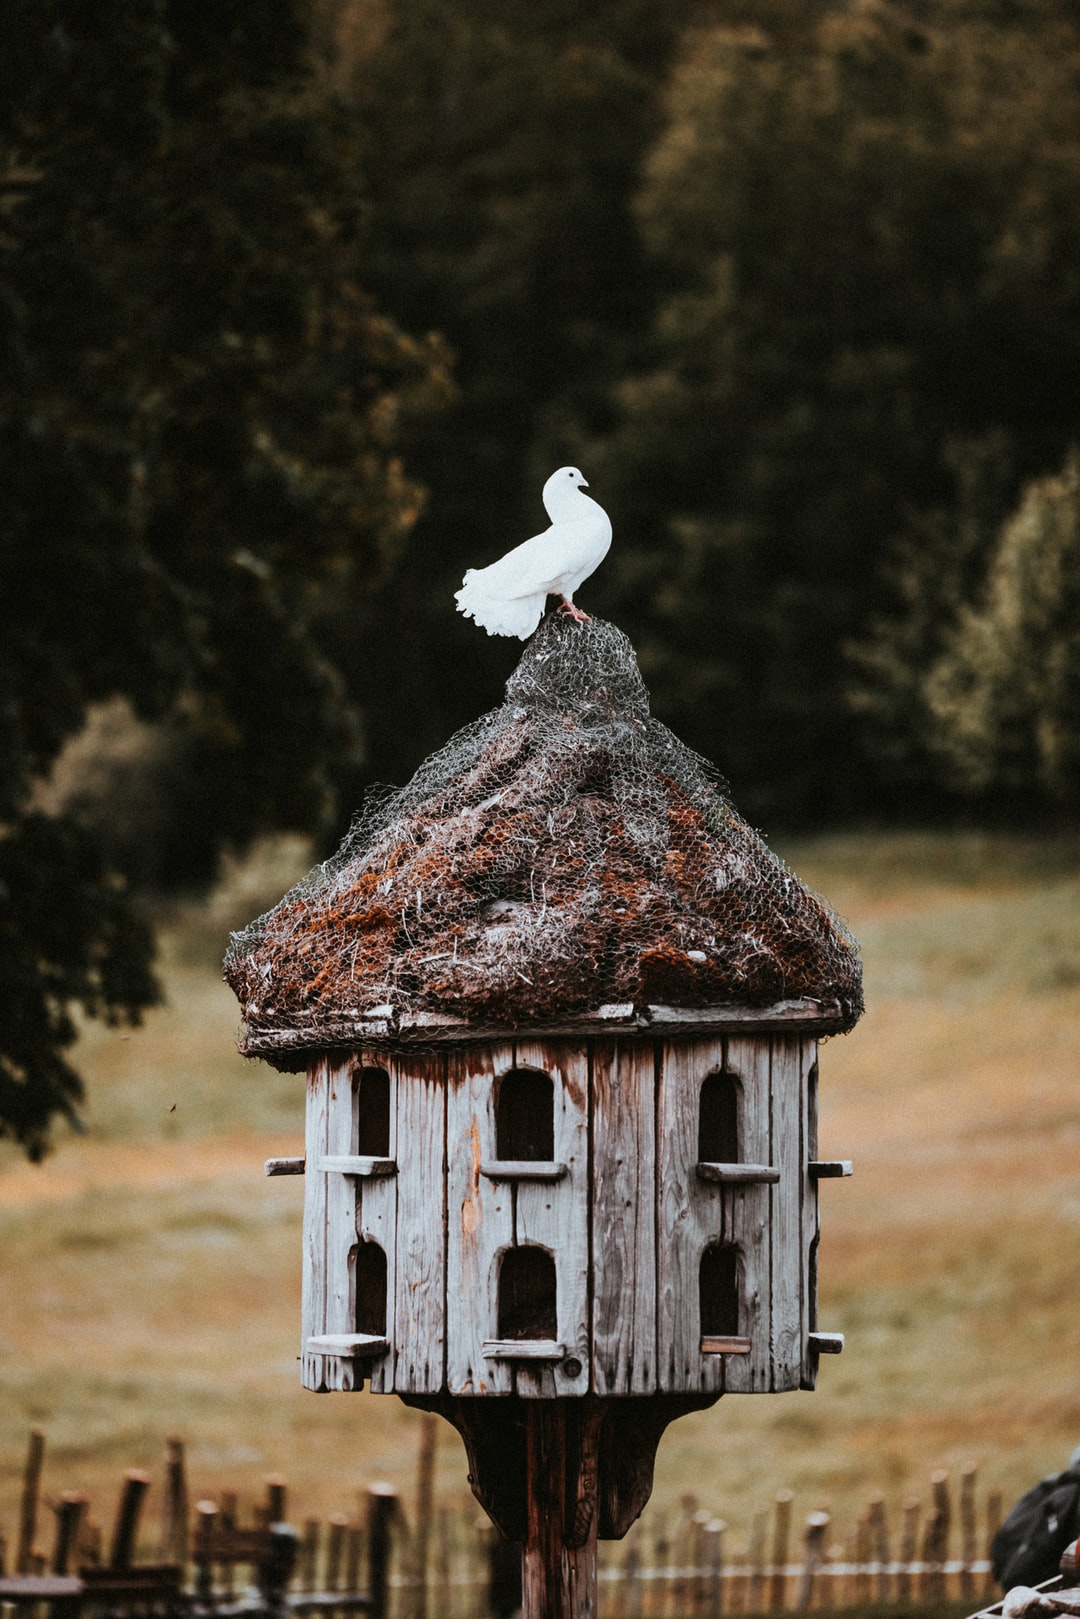 pigeon sitting on a birdhouse